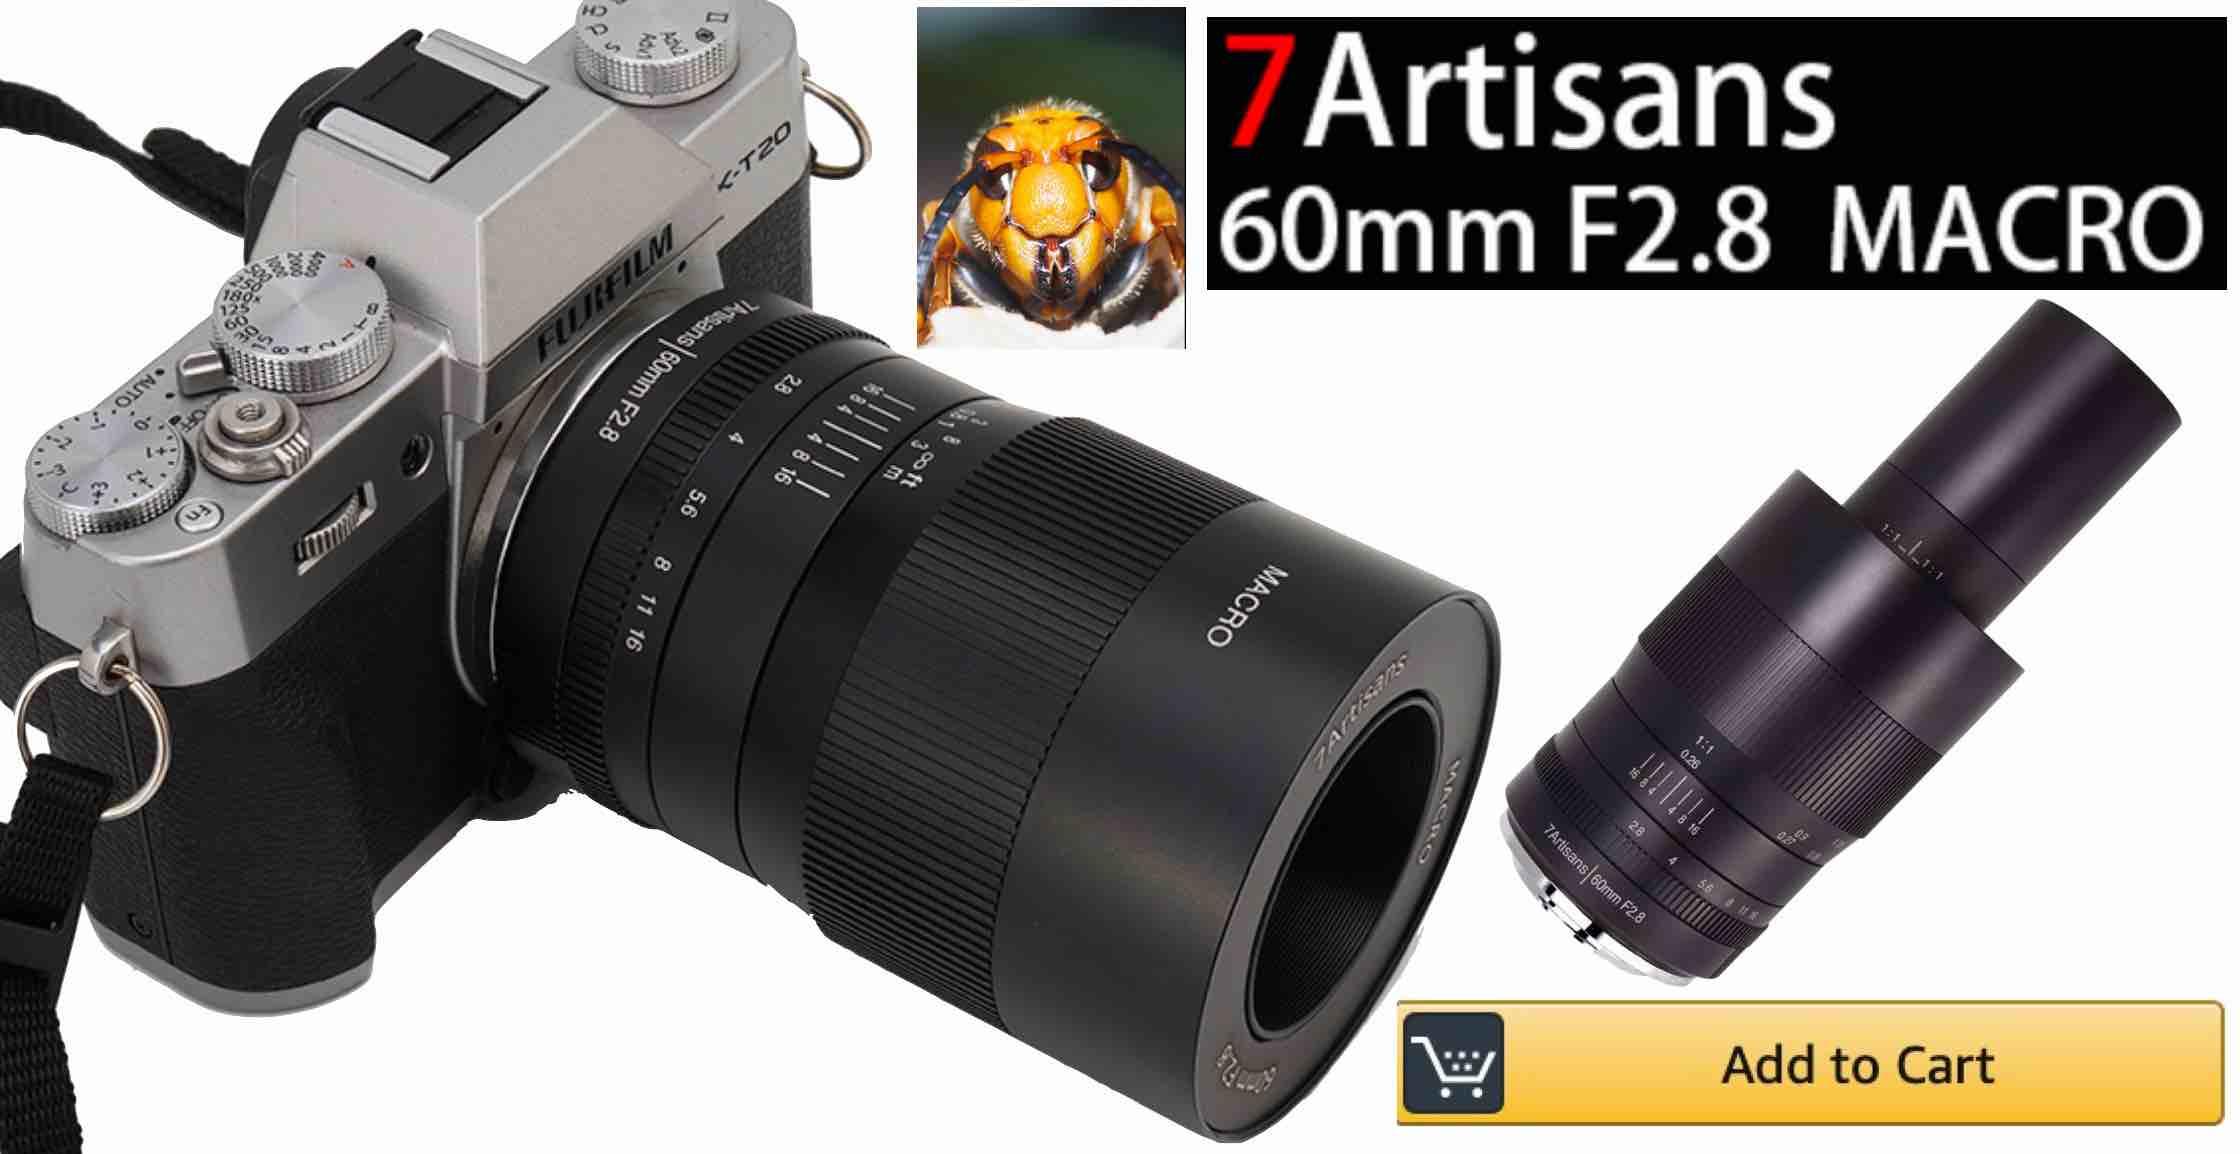 7Artisans 60mm f/2.8 Macro Available - Fuji Rumors